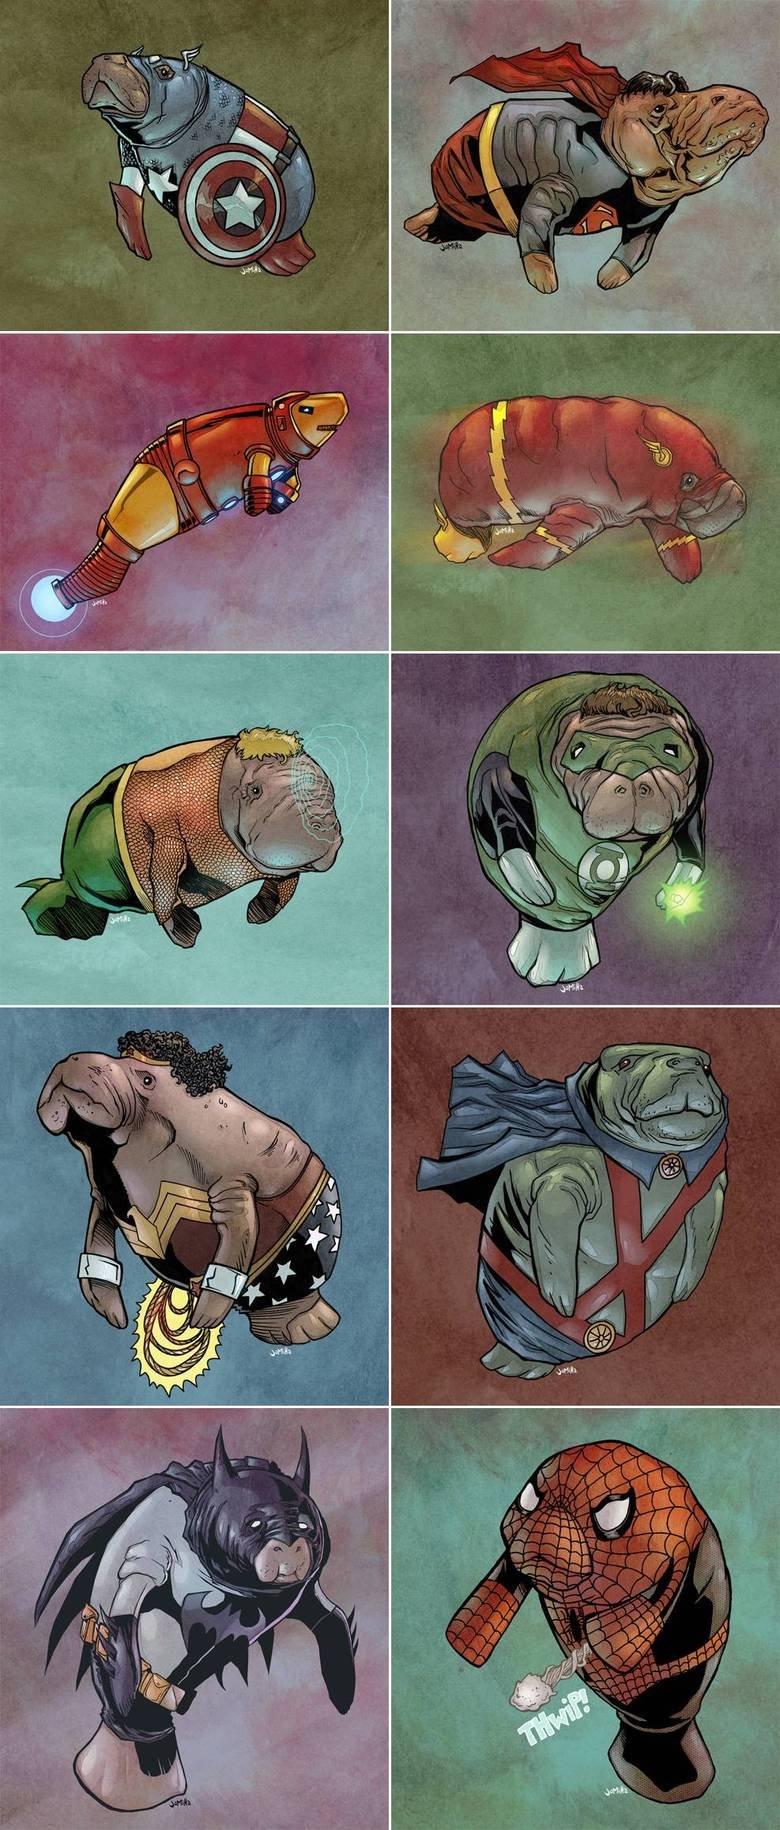 Manatee Superheroes. .. Lost it at Aquamanatee. Manatee Superheroes Lost it at Aquamanatee